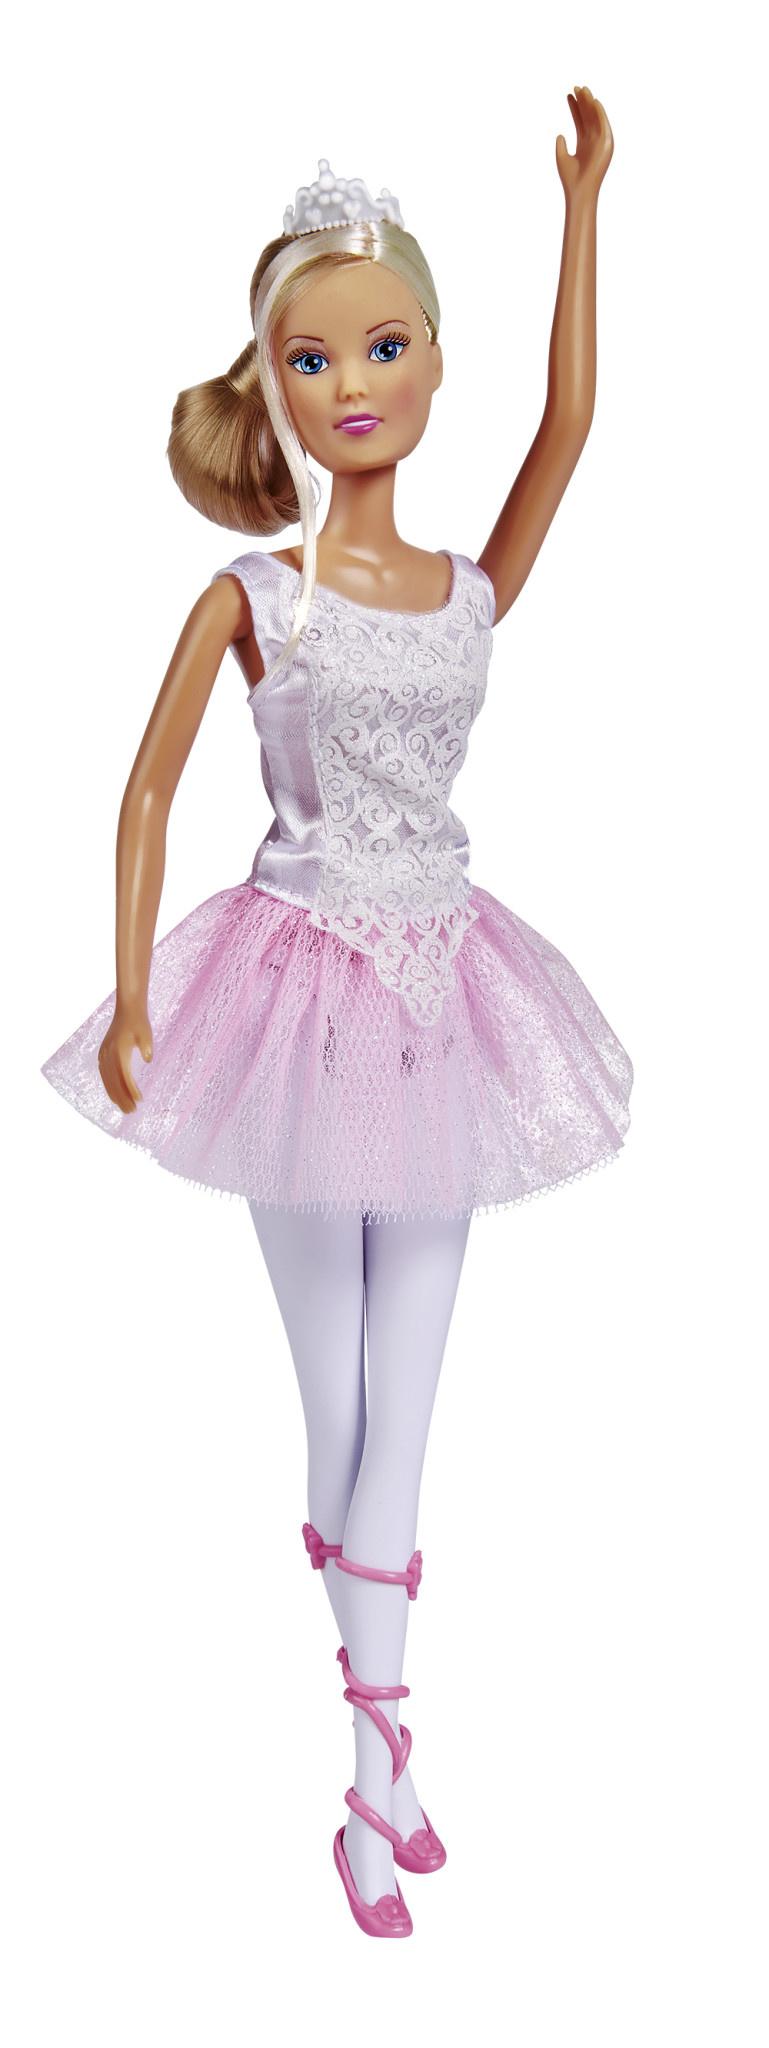 Steffi Love Steffi Love Ballerina Doll